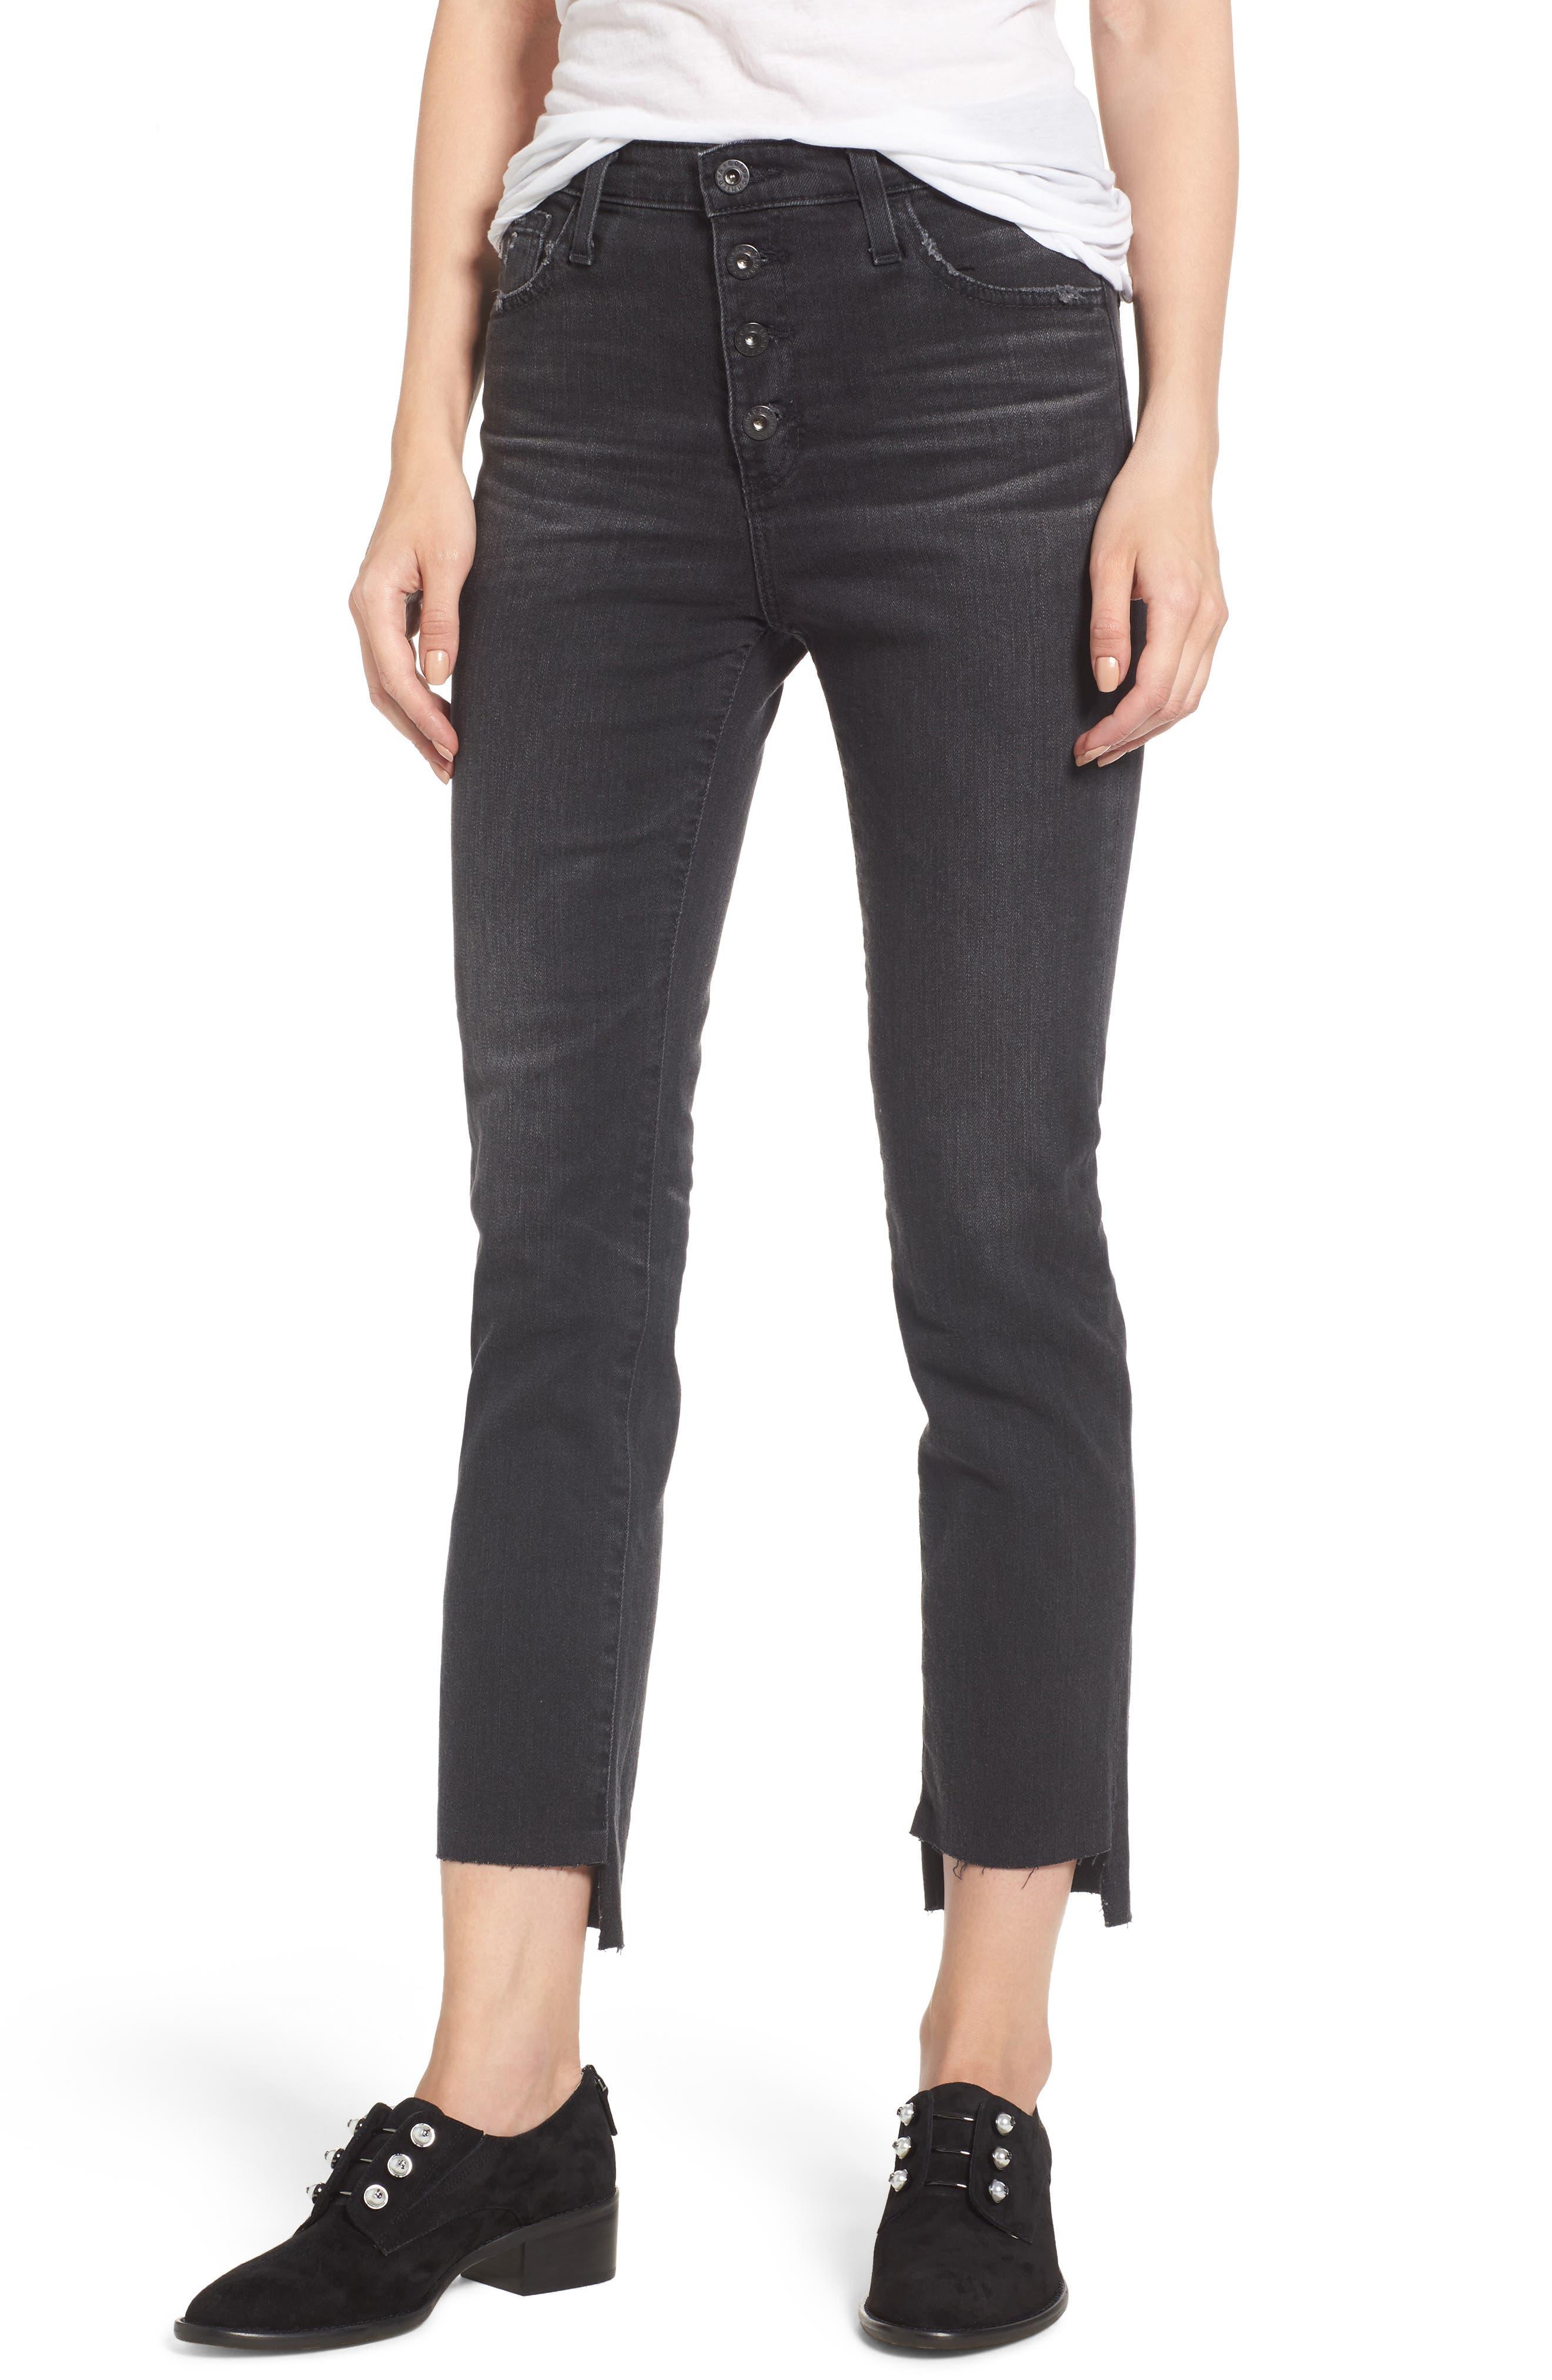 AG Isabelle High Waist Step Hem Jeans